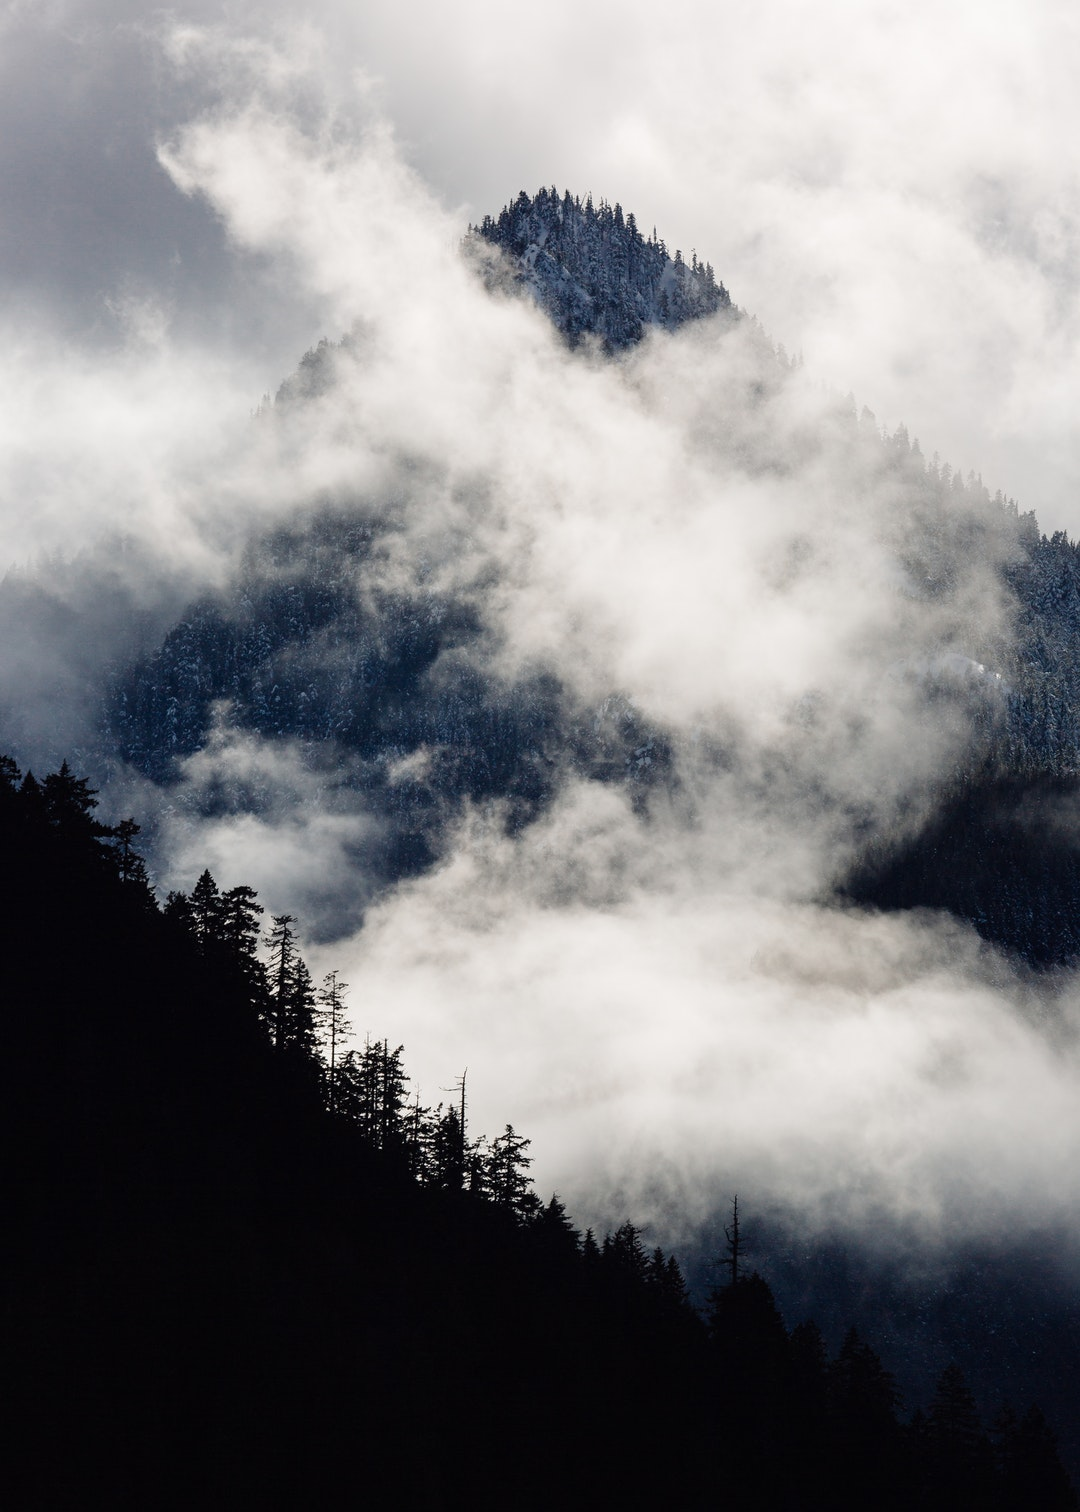 جبل بركاني ثائر ازرق مع ضباب كثيف و غابة - خلفيات ايفون X